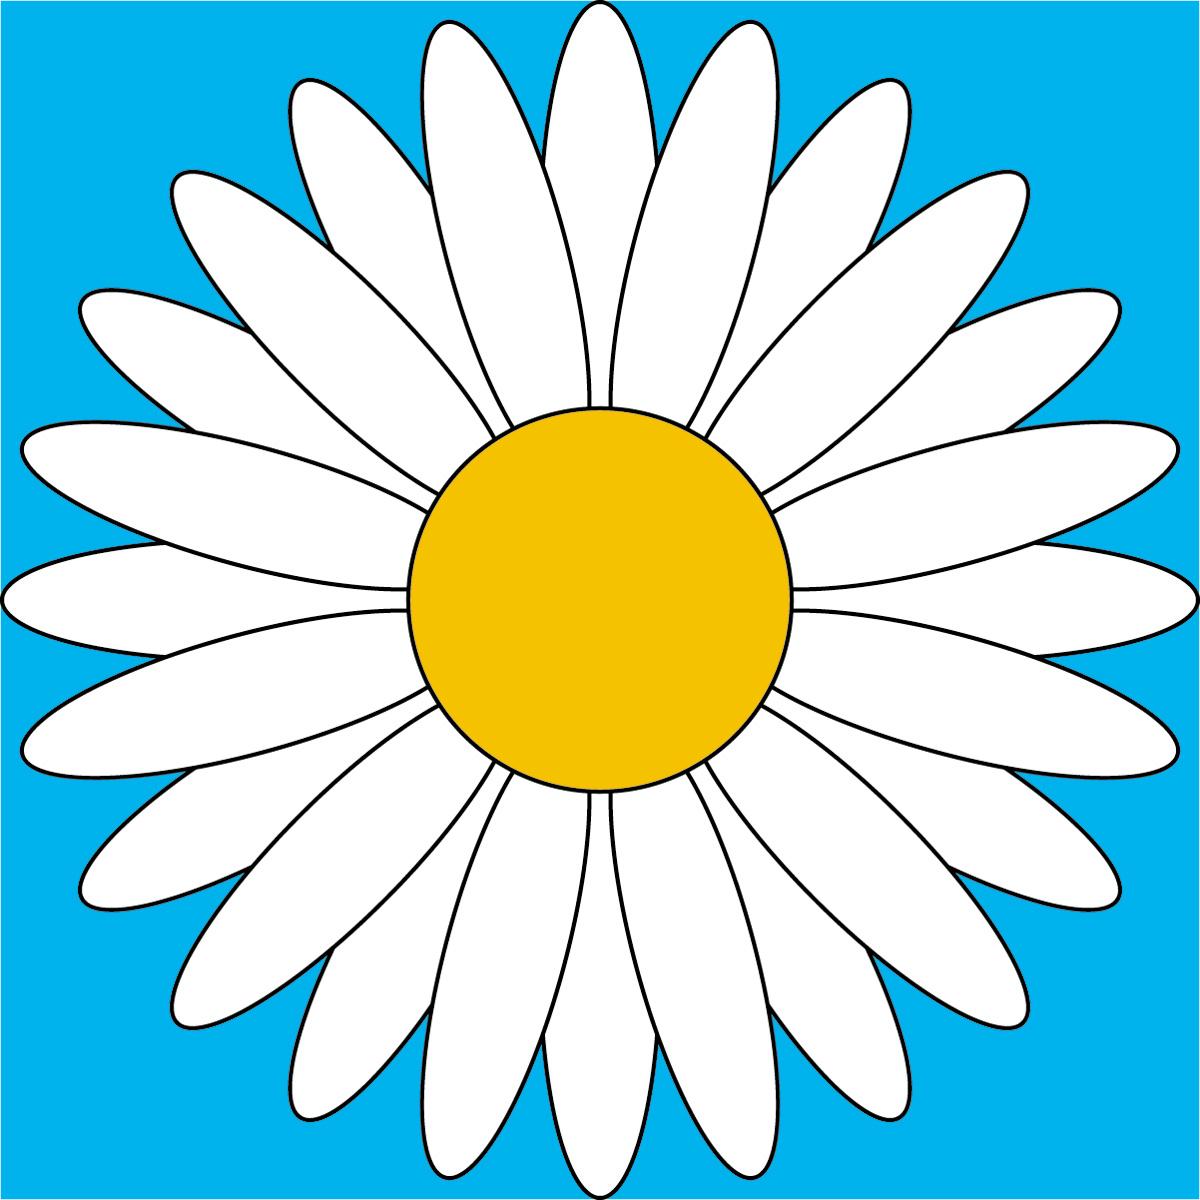 Free Daisy Clipart Public .-Free daisy clipart public .-14